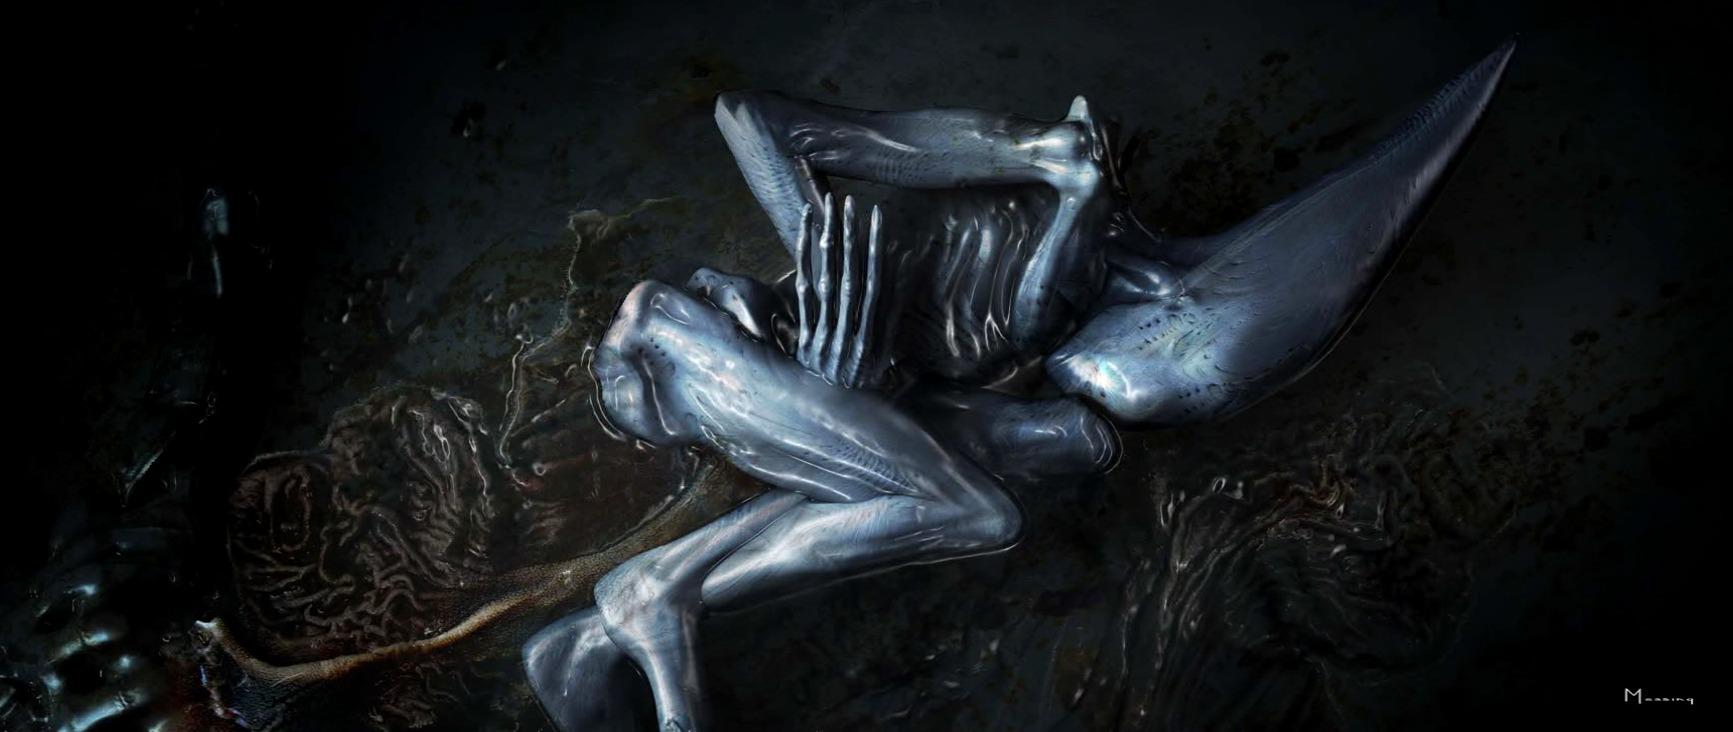 3d alien birth erotica beauty chick